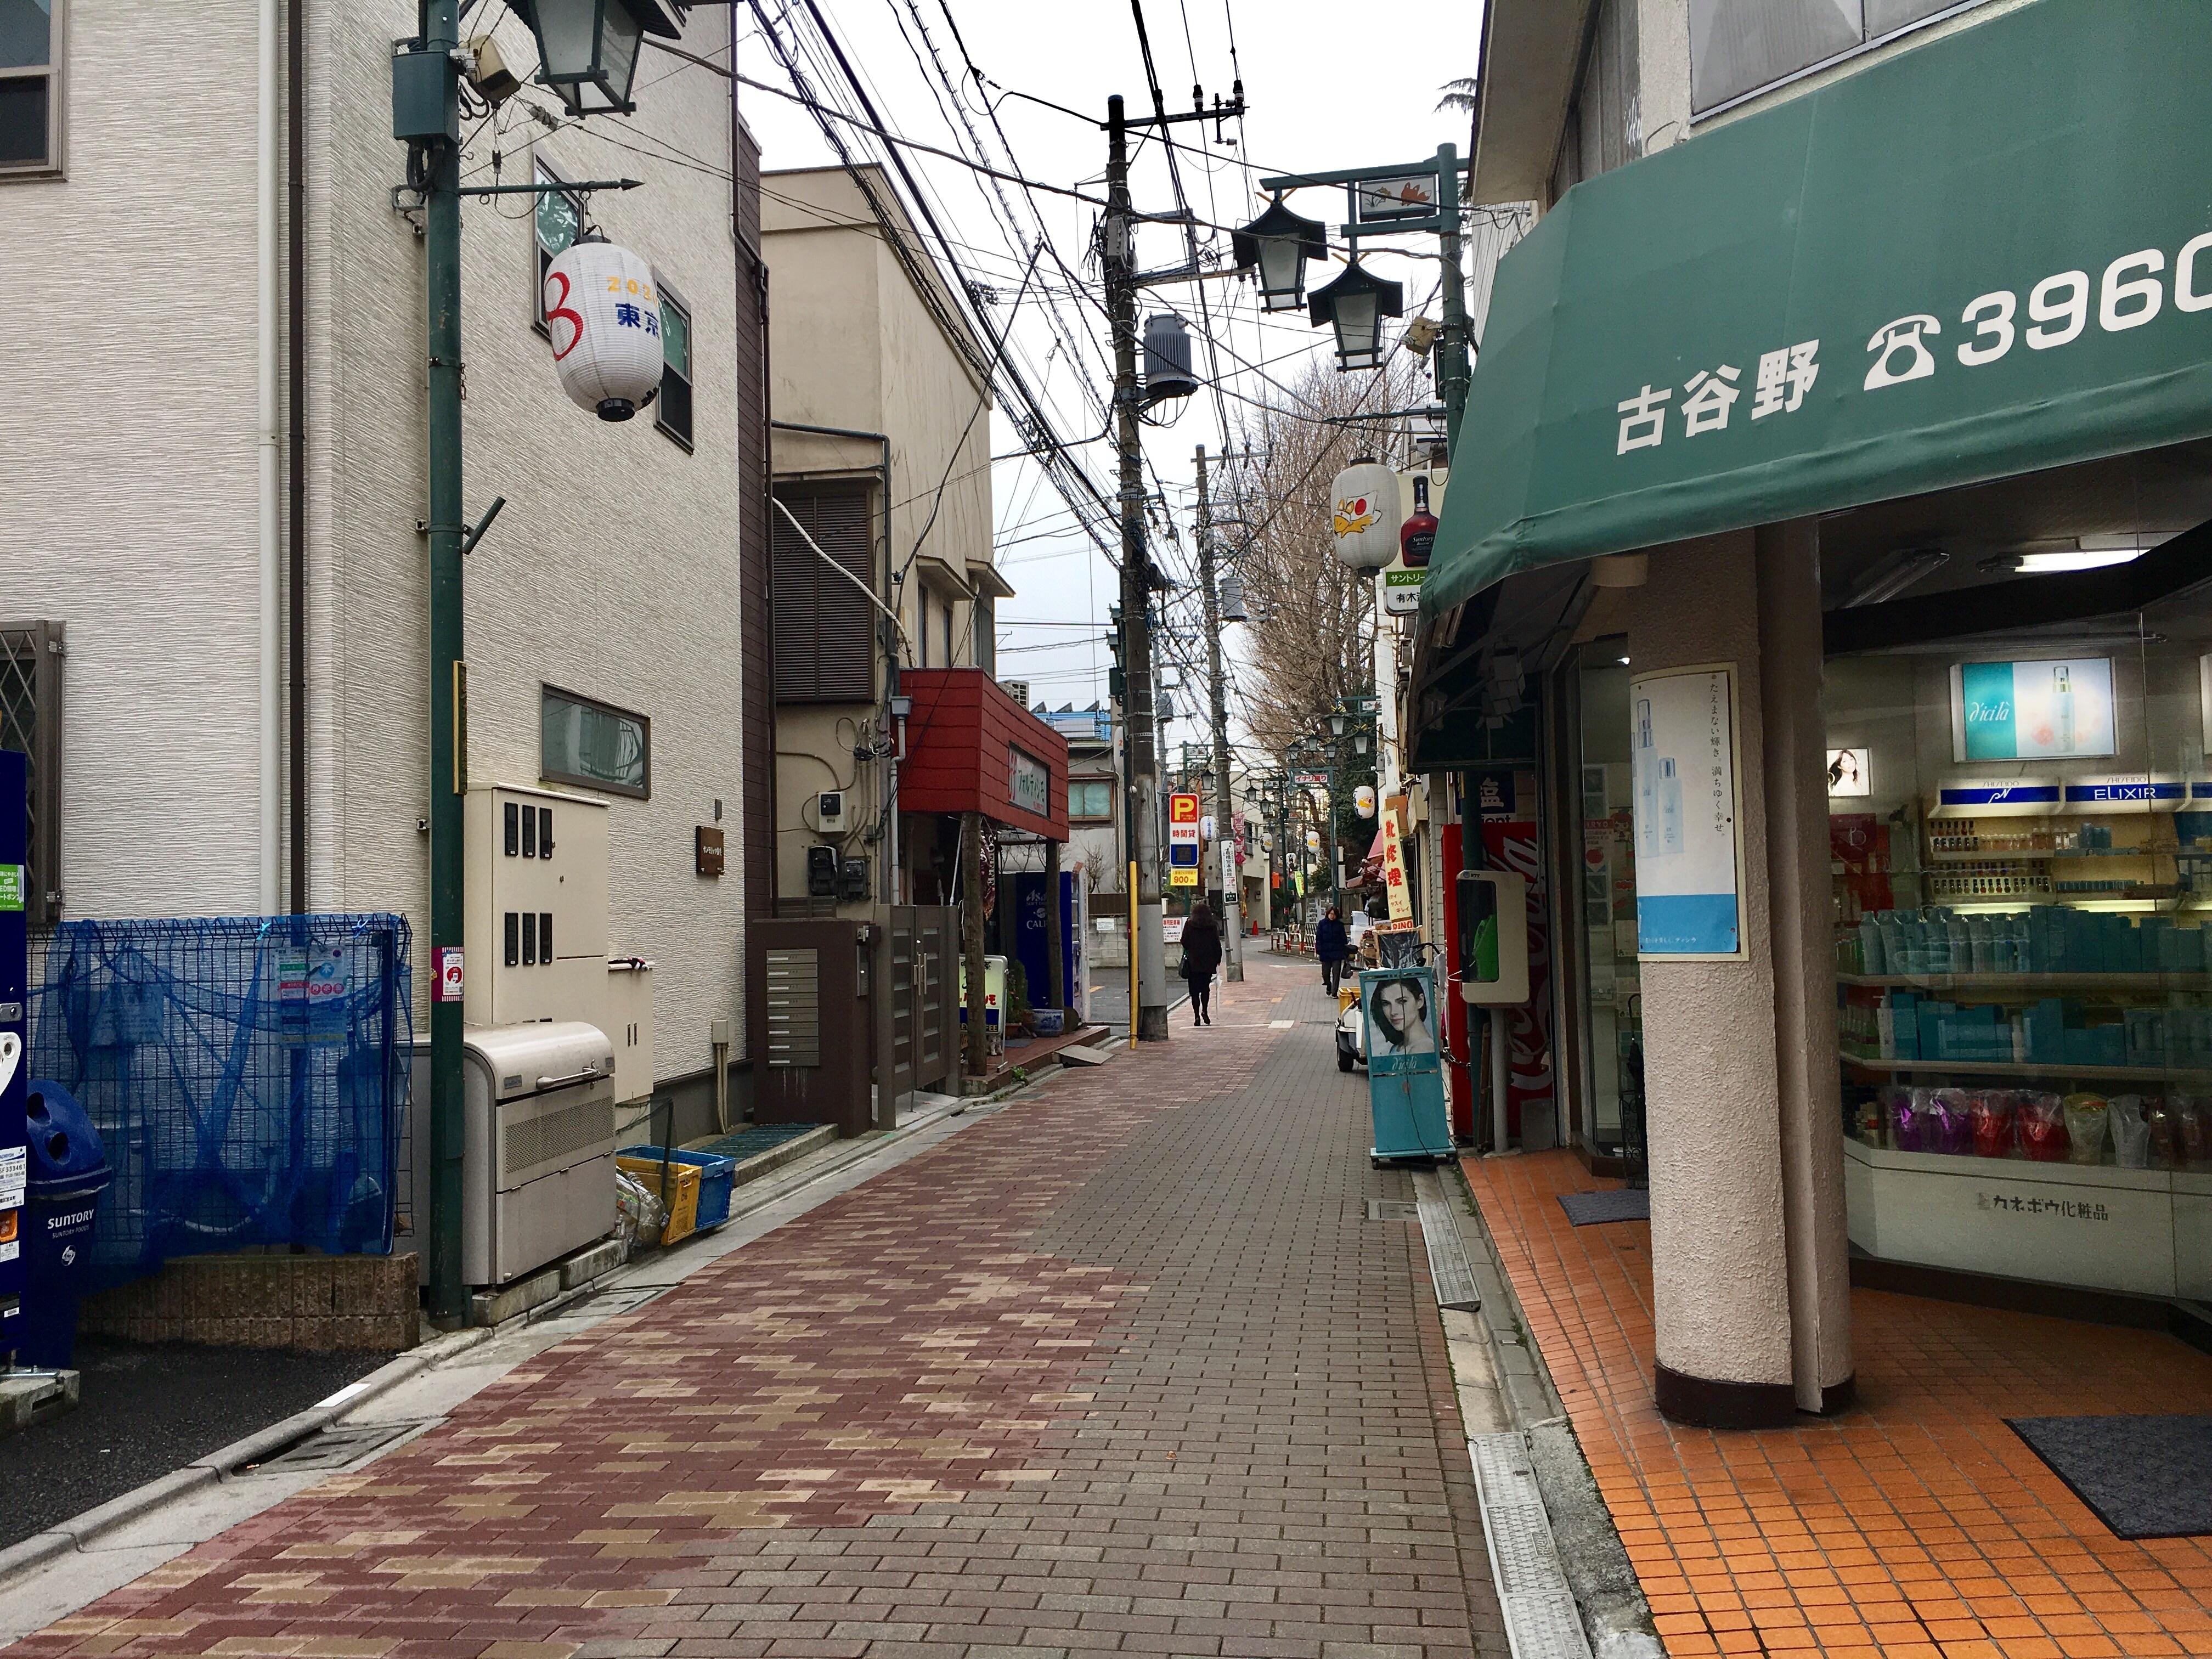 f:id:SoichiroIkeshita:20170315142054j:image